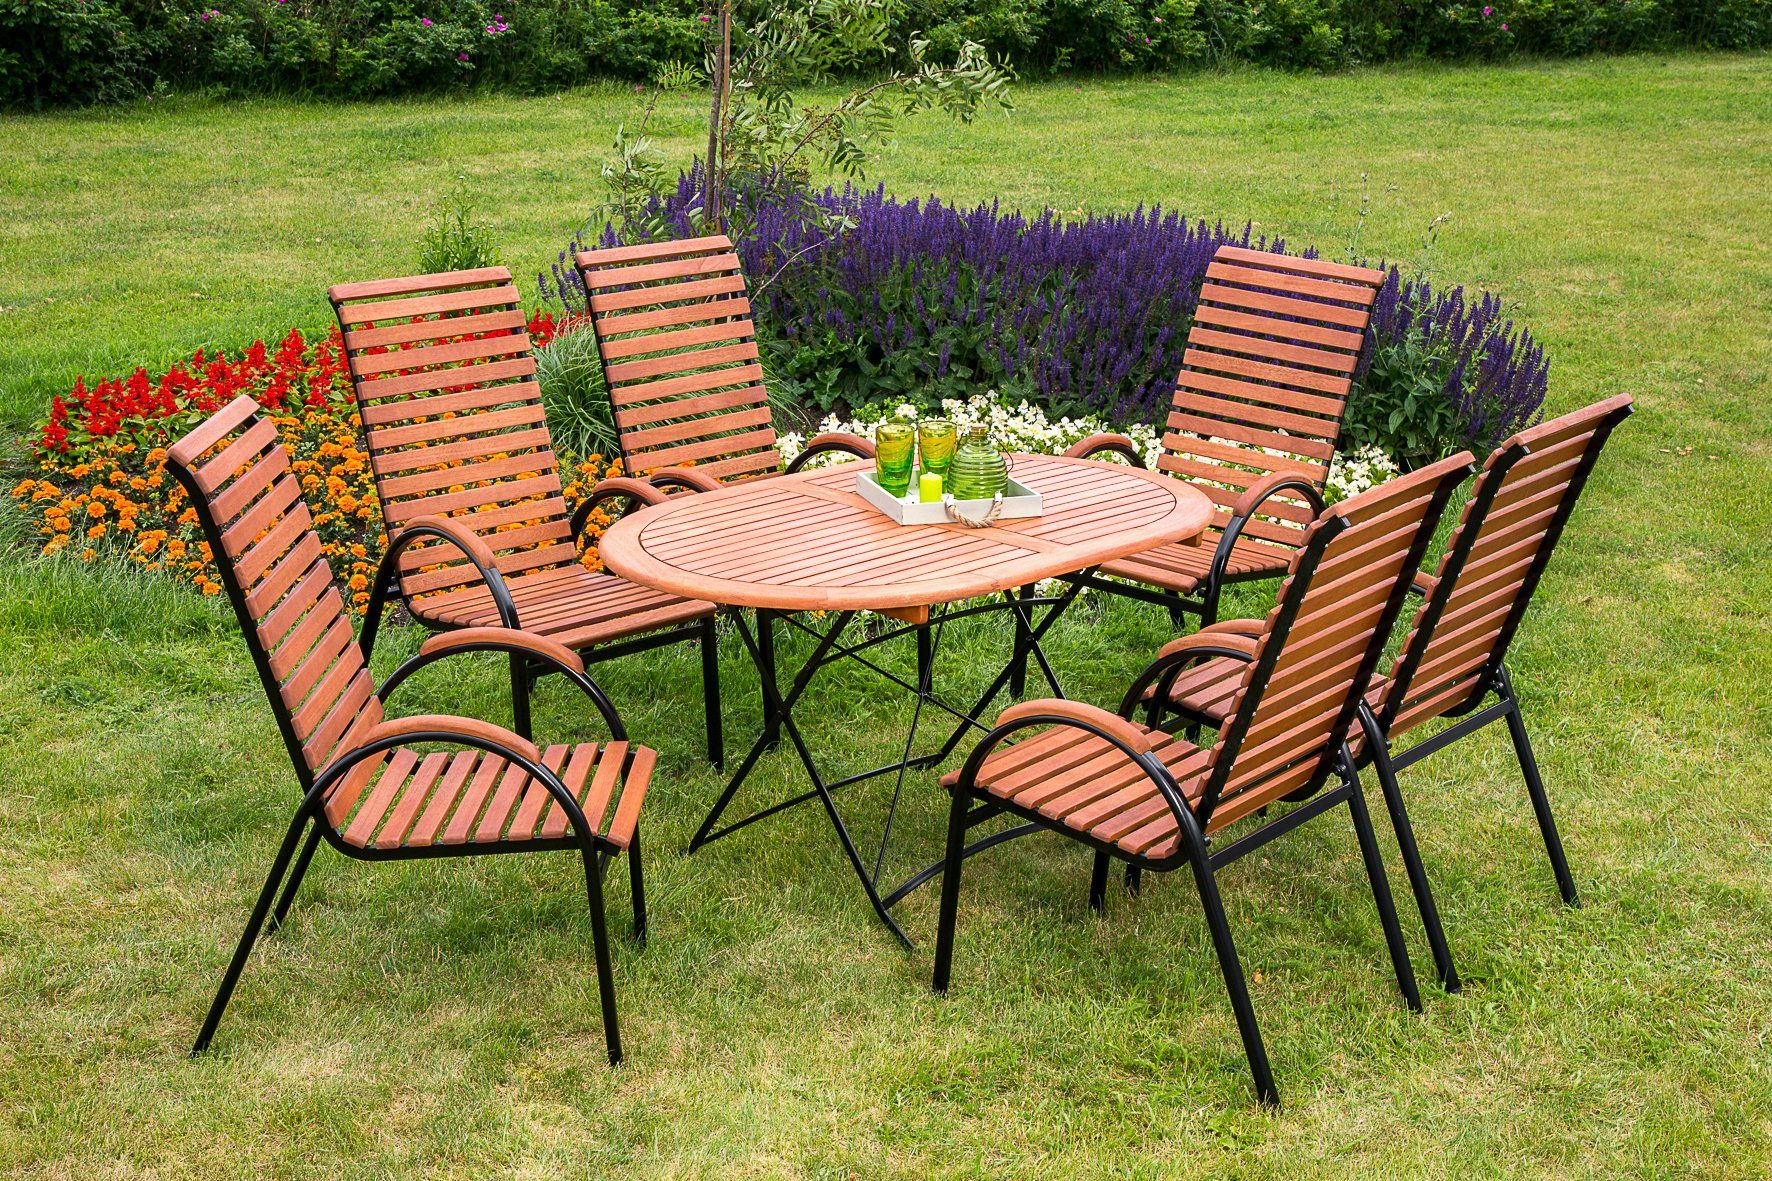 Inklapbare Tafel Kopen : Merxx tuinmeubelset schloßgarten« dlg stoelen tafel